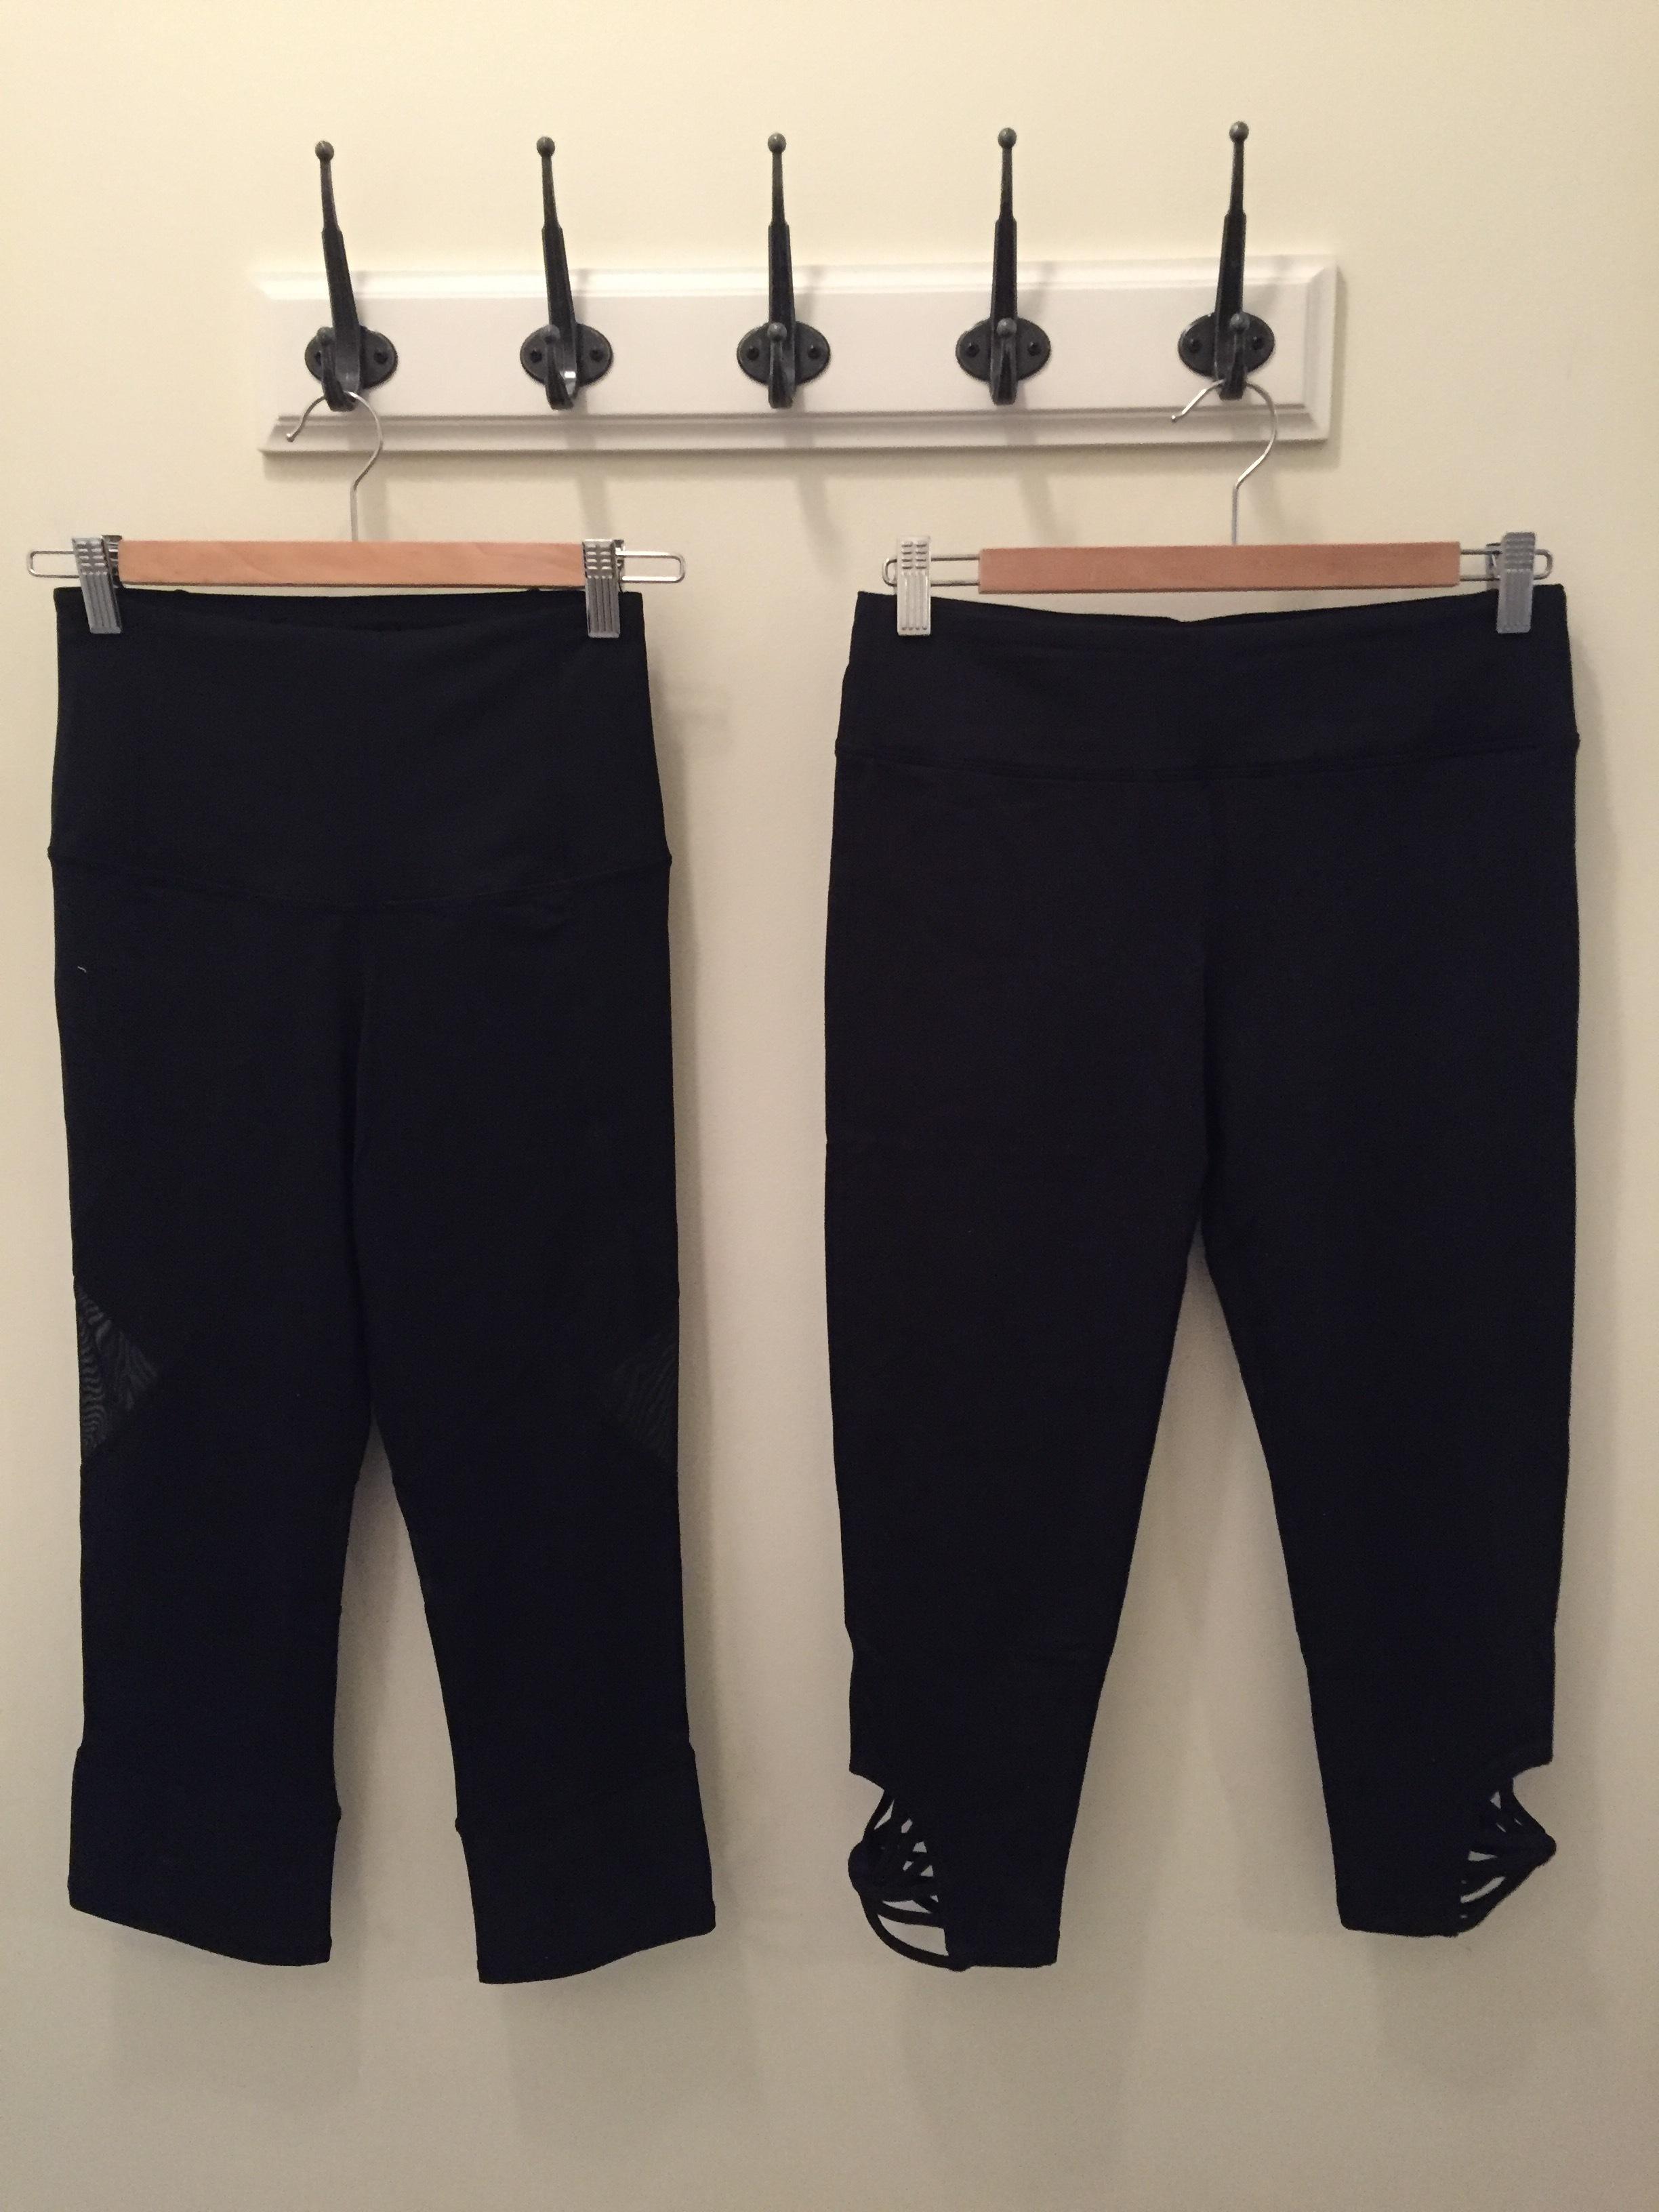 Calf Length Legging $35, $28